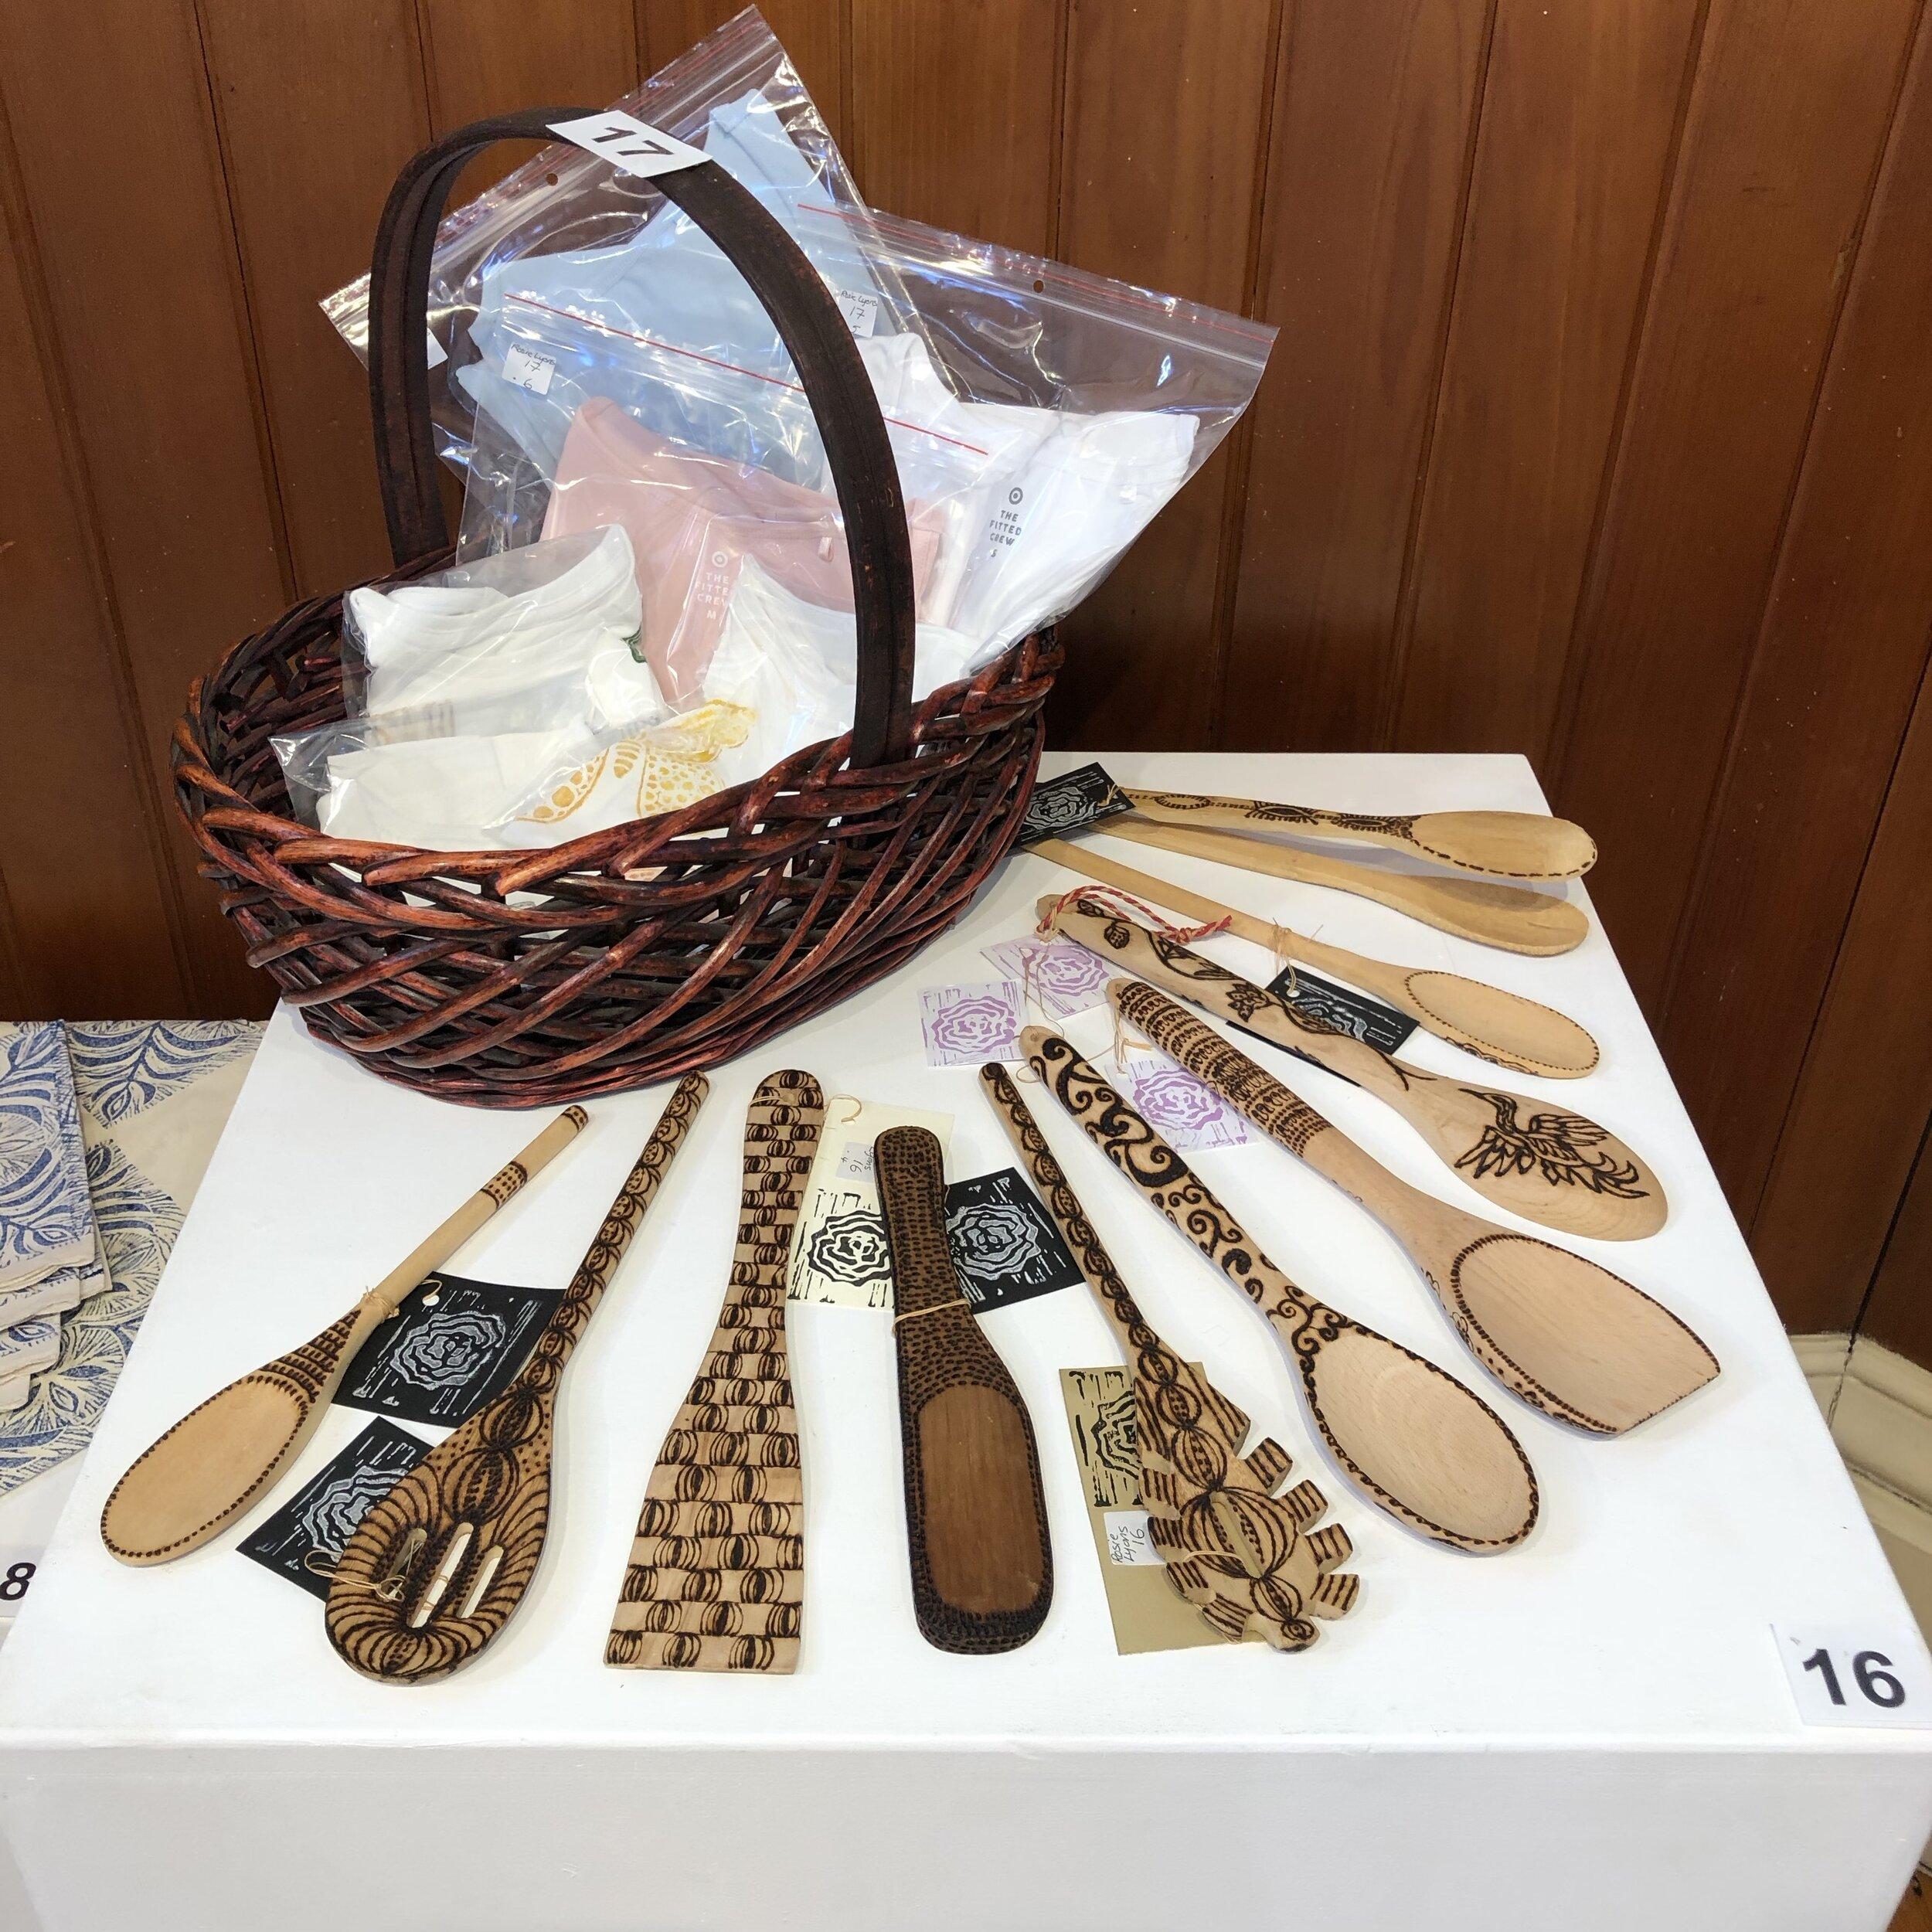 """Wooden Spoons"" by Rosie Lyons"